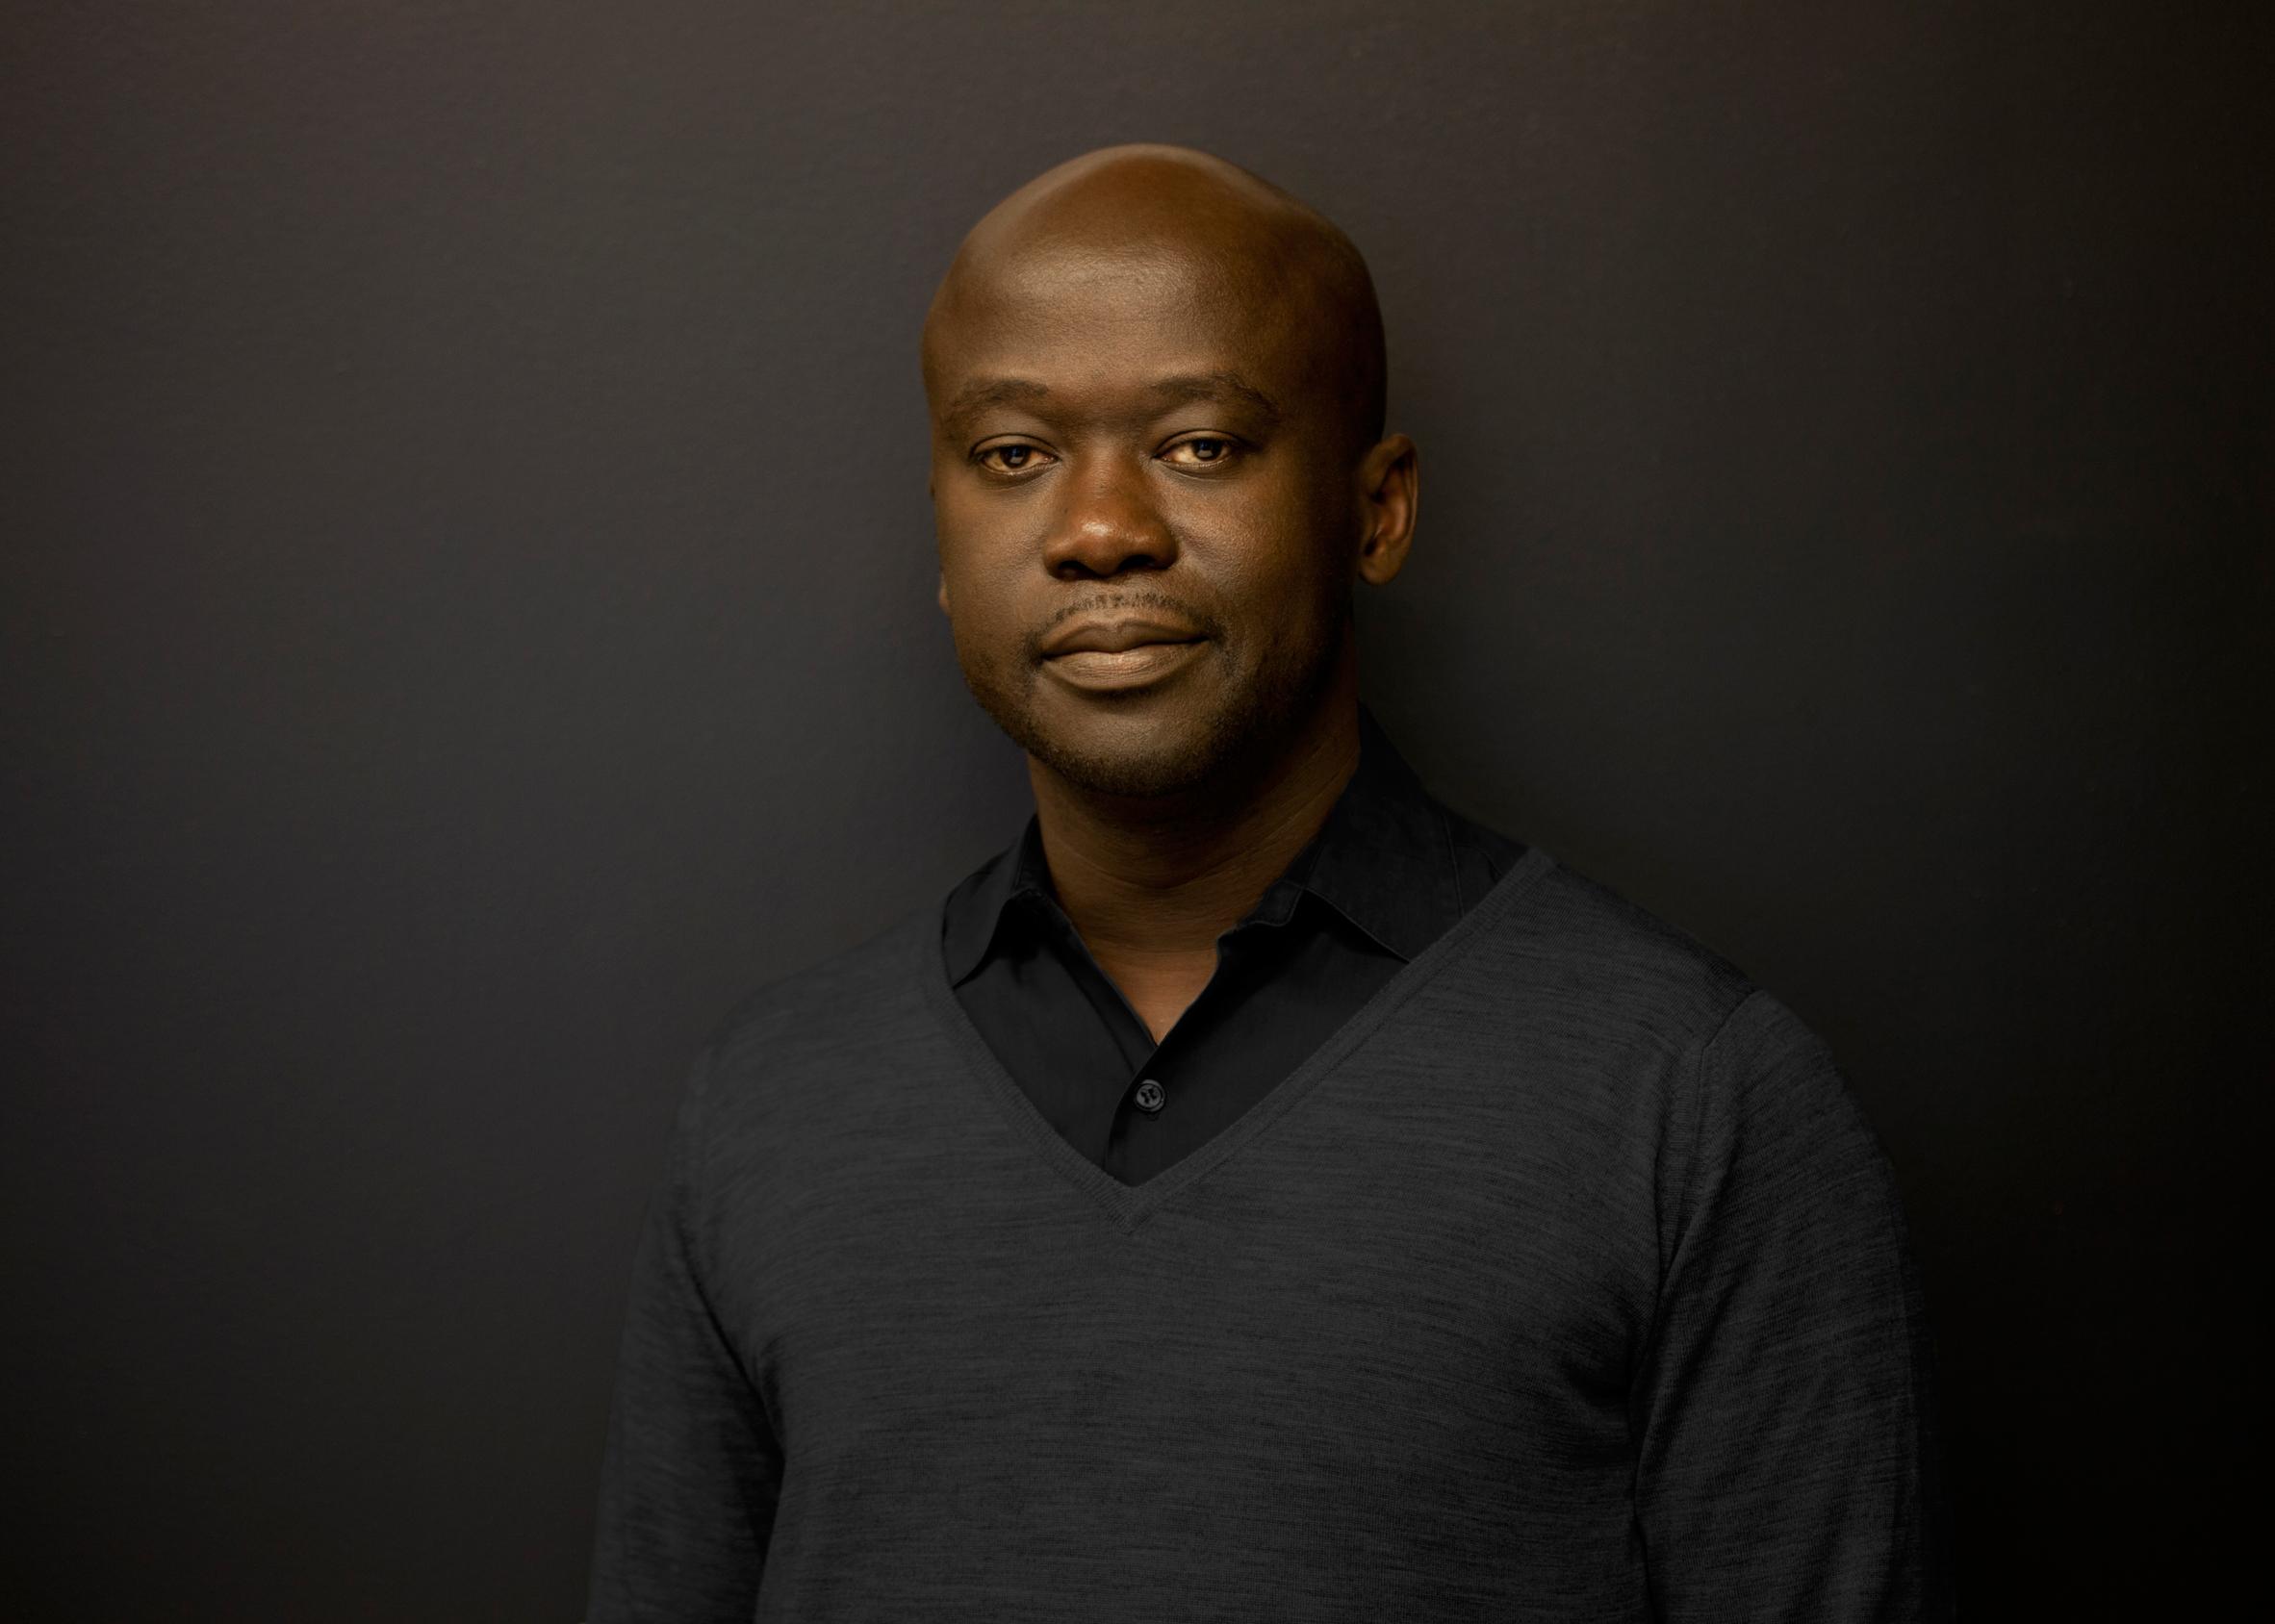 David Adjaye wins London Design Medal 2016